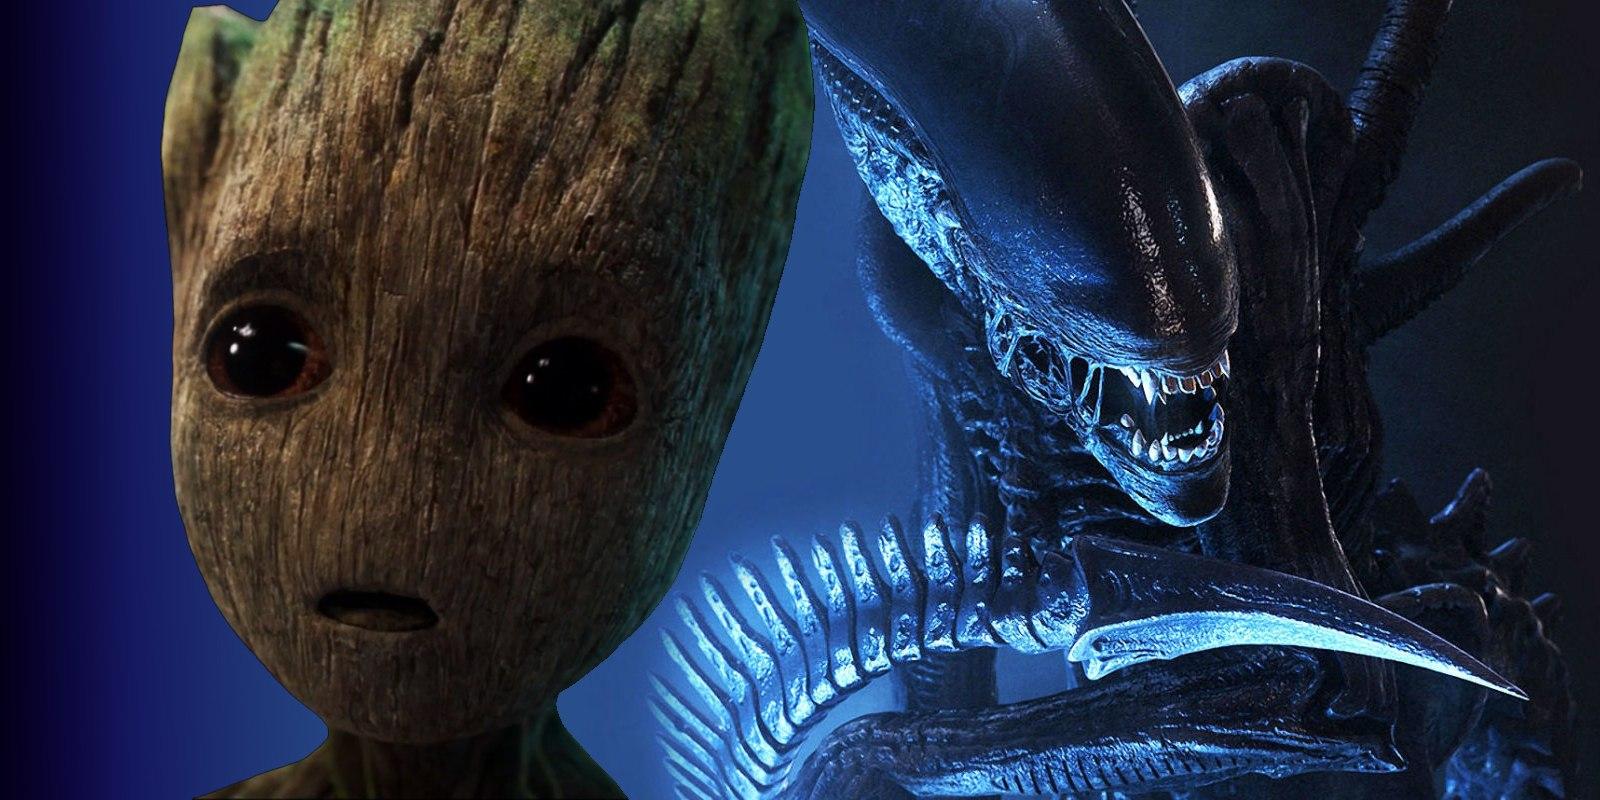 alien covenant pushes guardians down box office chart 2017 images